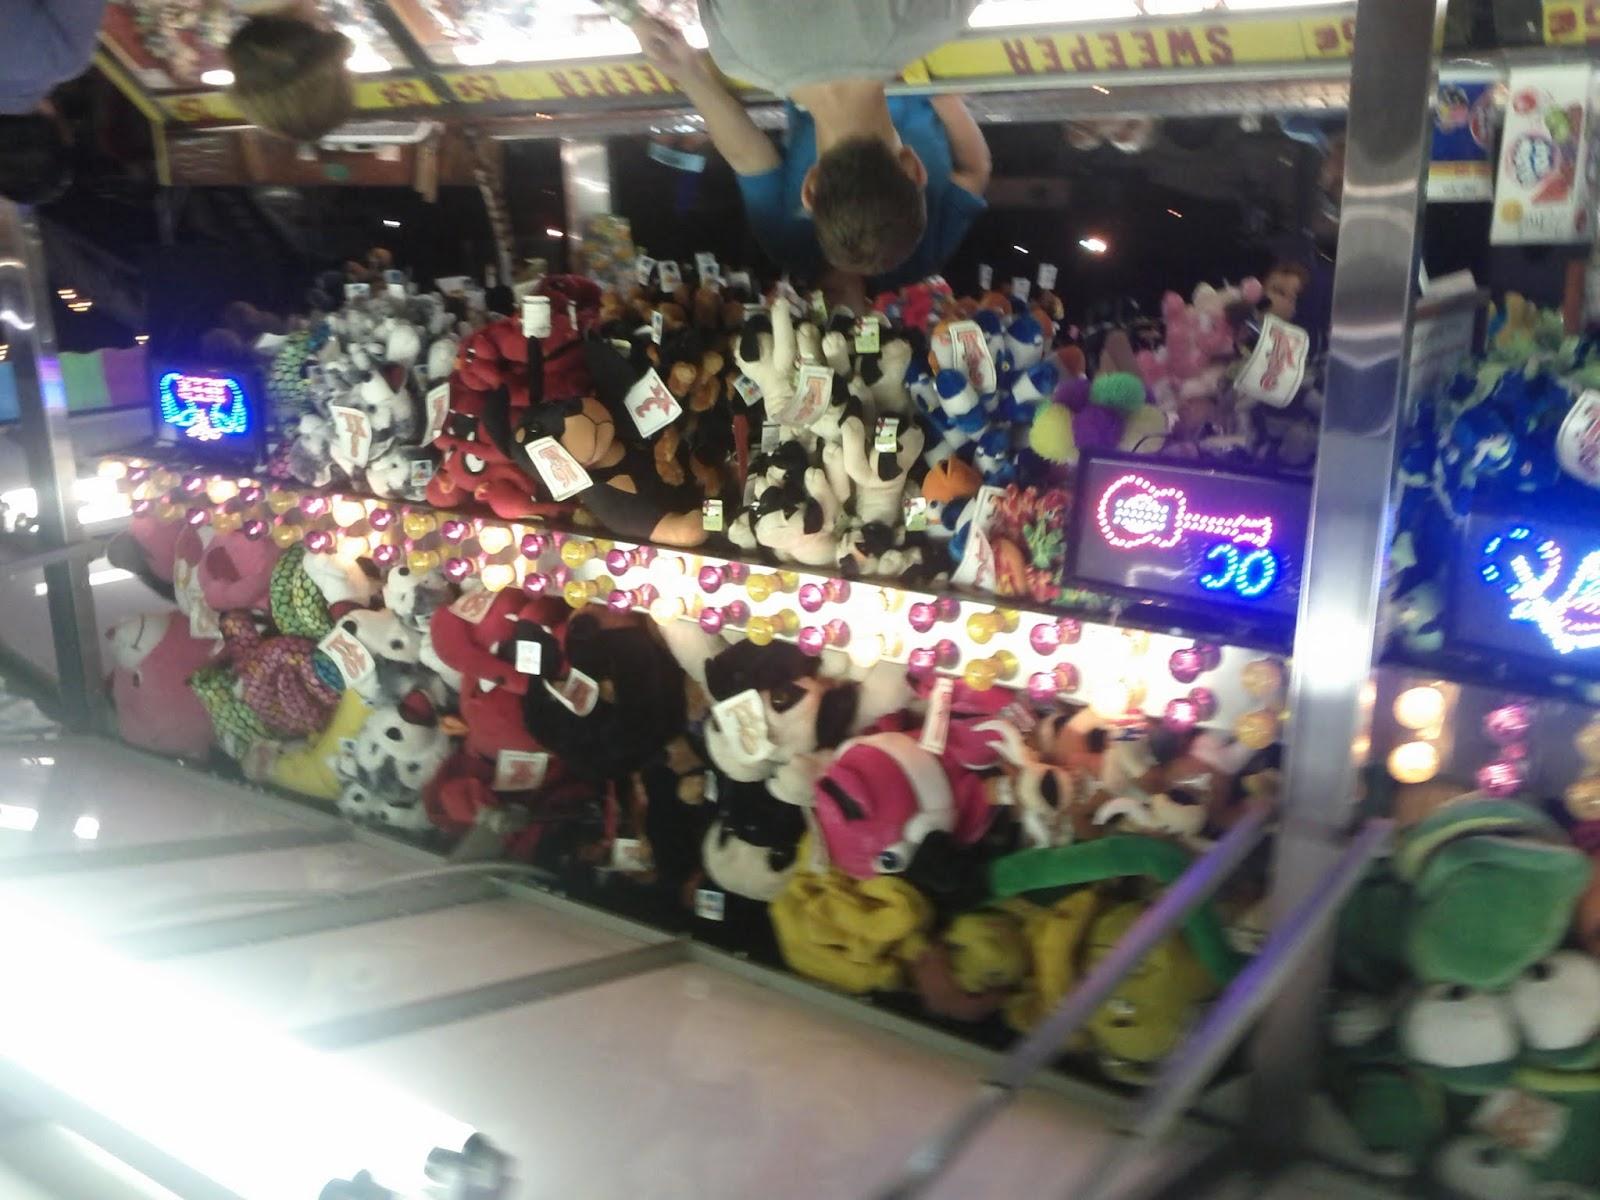 Fort Bend County Fair 2012 - IMG_20121006_202146.jpg